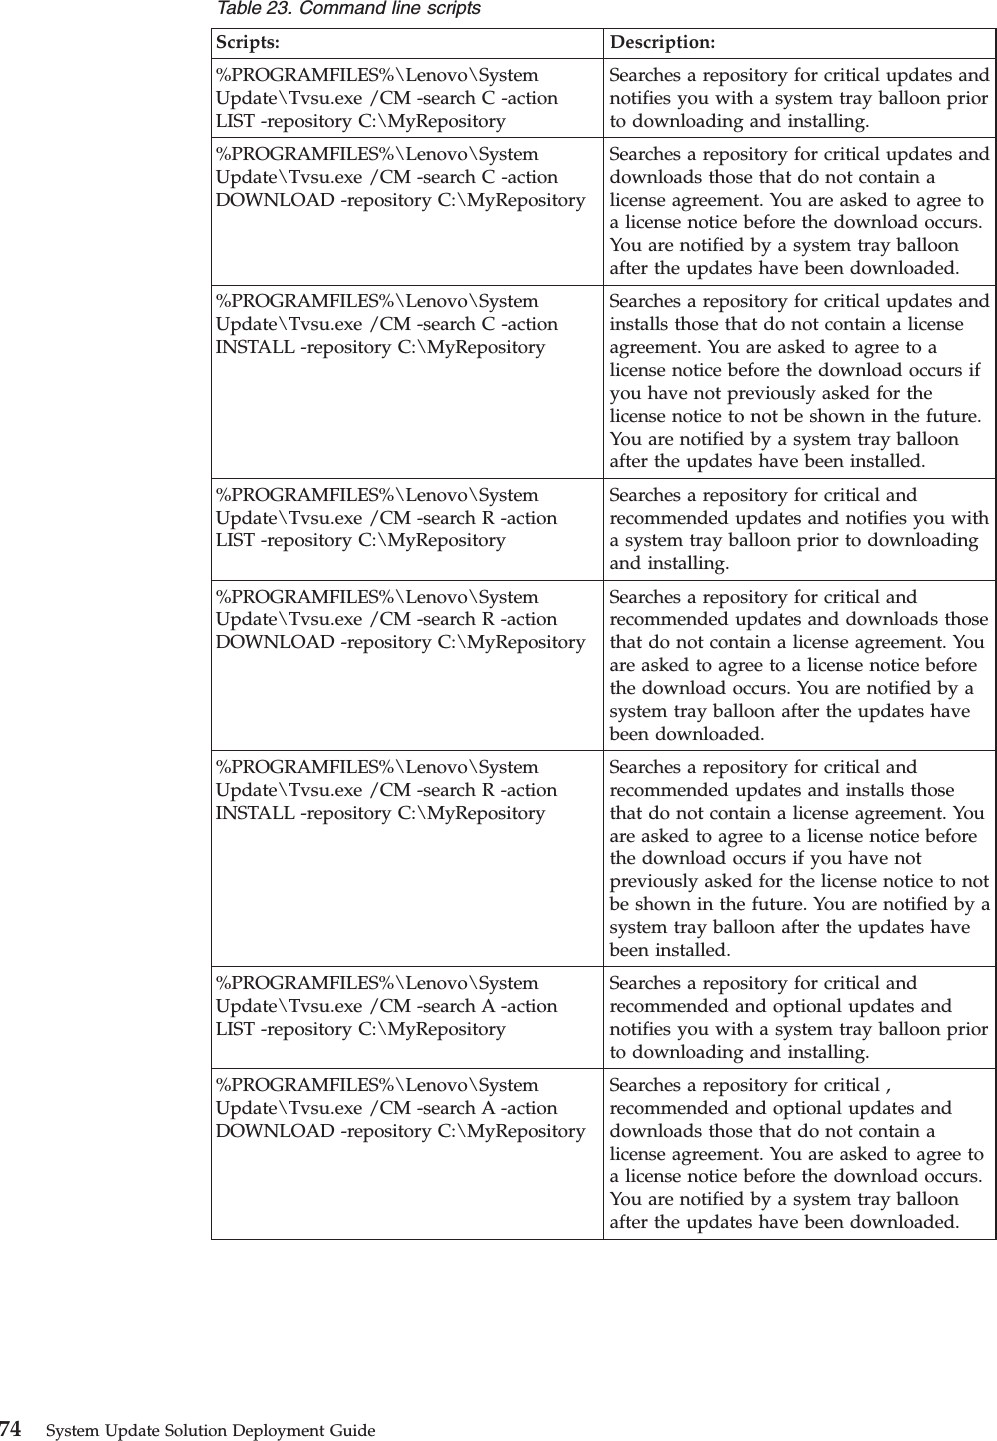 Lenovo Tvsu314 Timr1 System Update Solution Deployment Guide